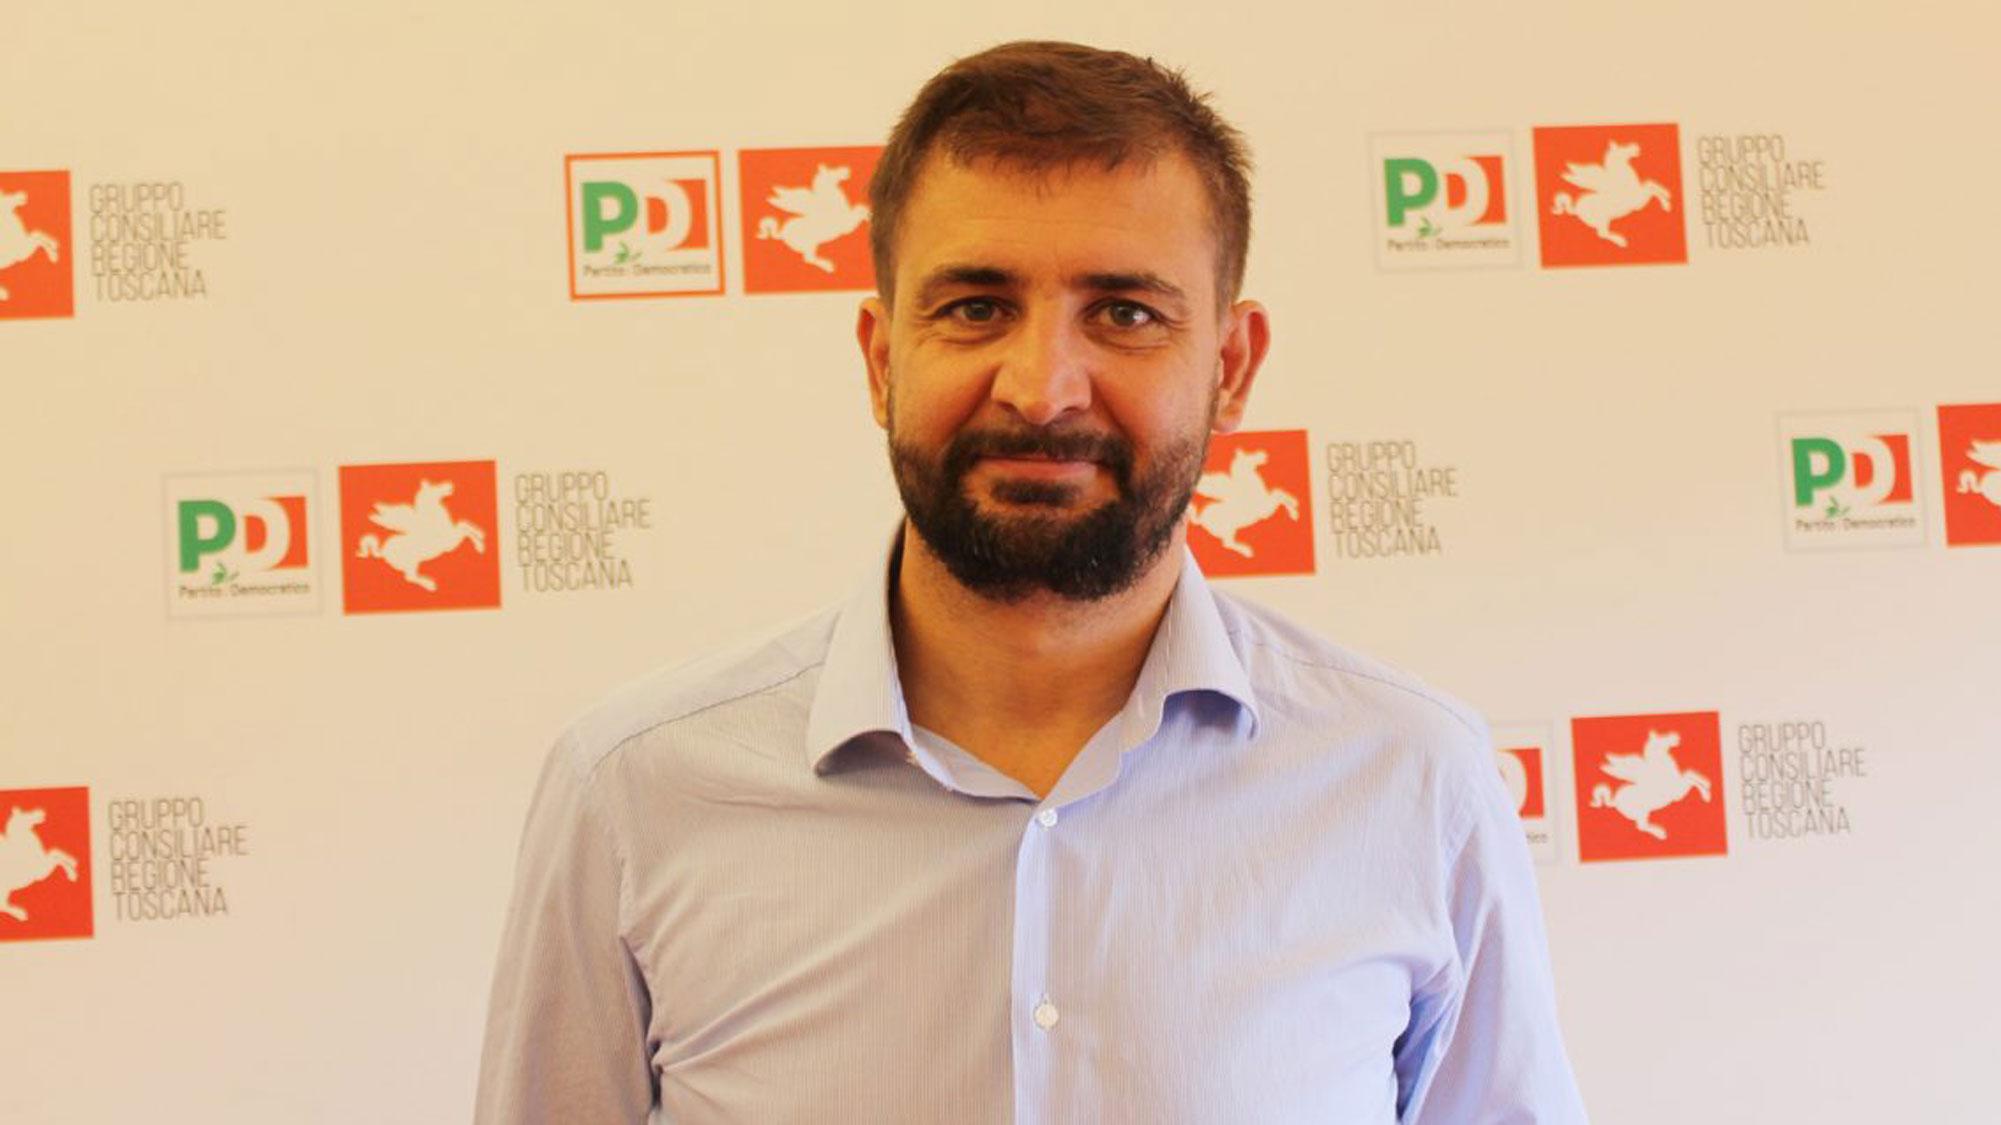 Nicola Ciolini